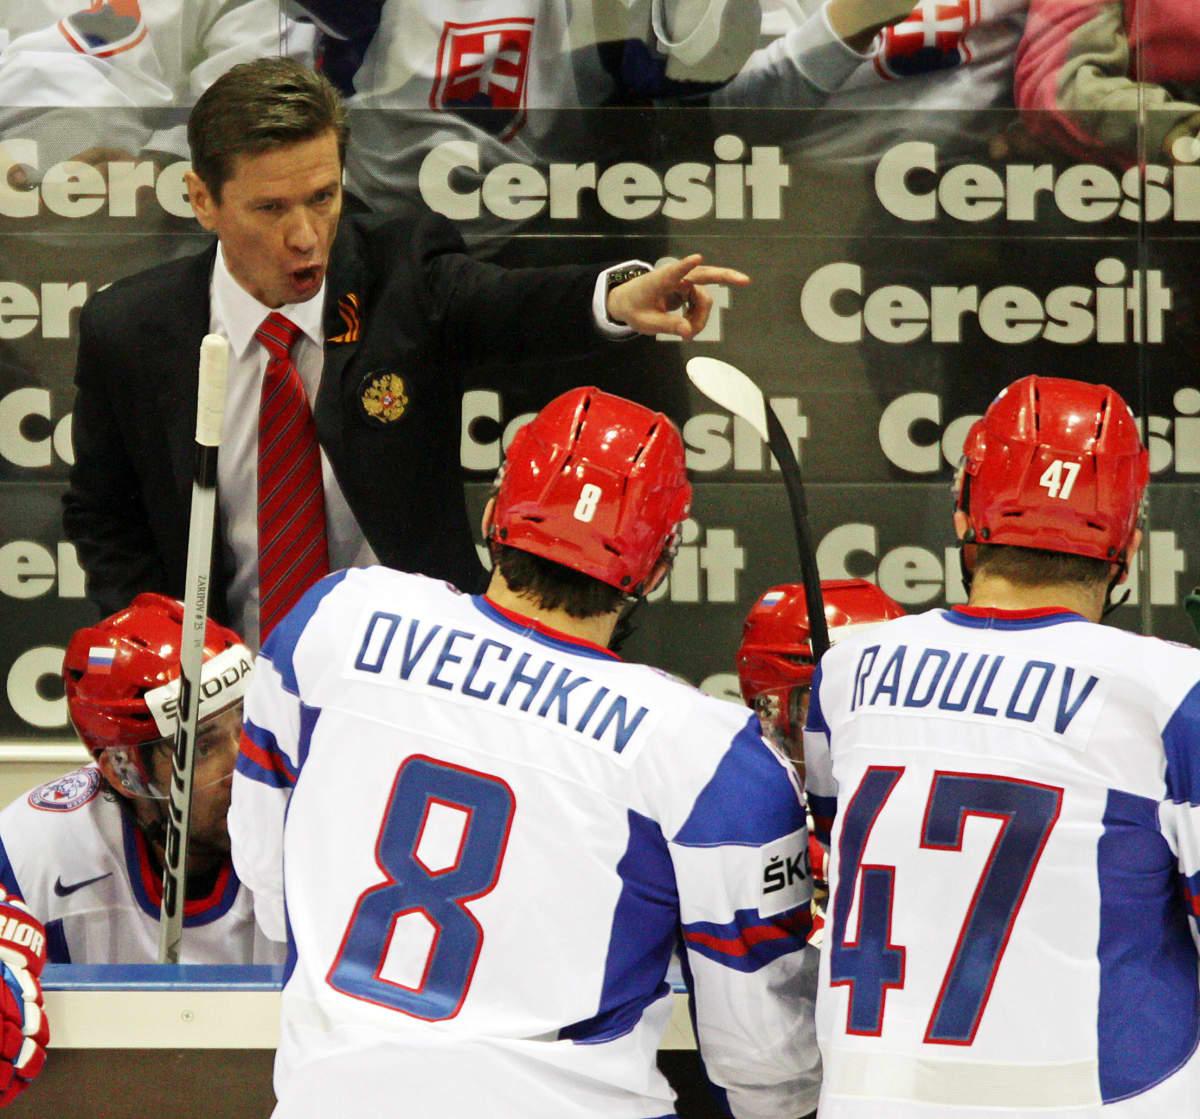 Vjatsheslav Bykov sai Venäjän päävalmentajana suuret Aleksanterit Ovetshkinin ja Radulovin pelaamaan joukkueelle.